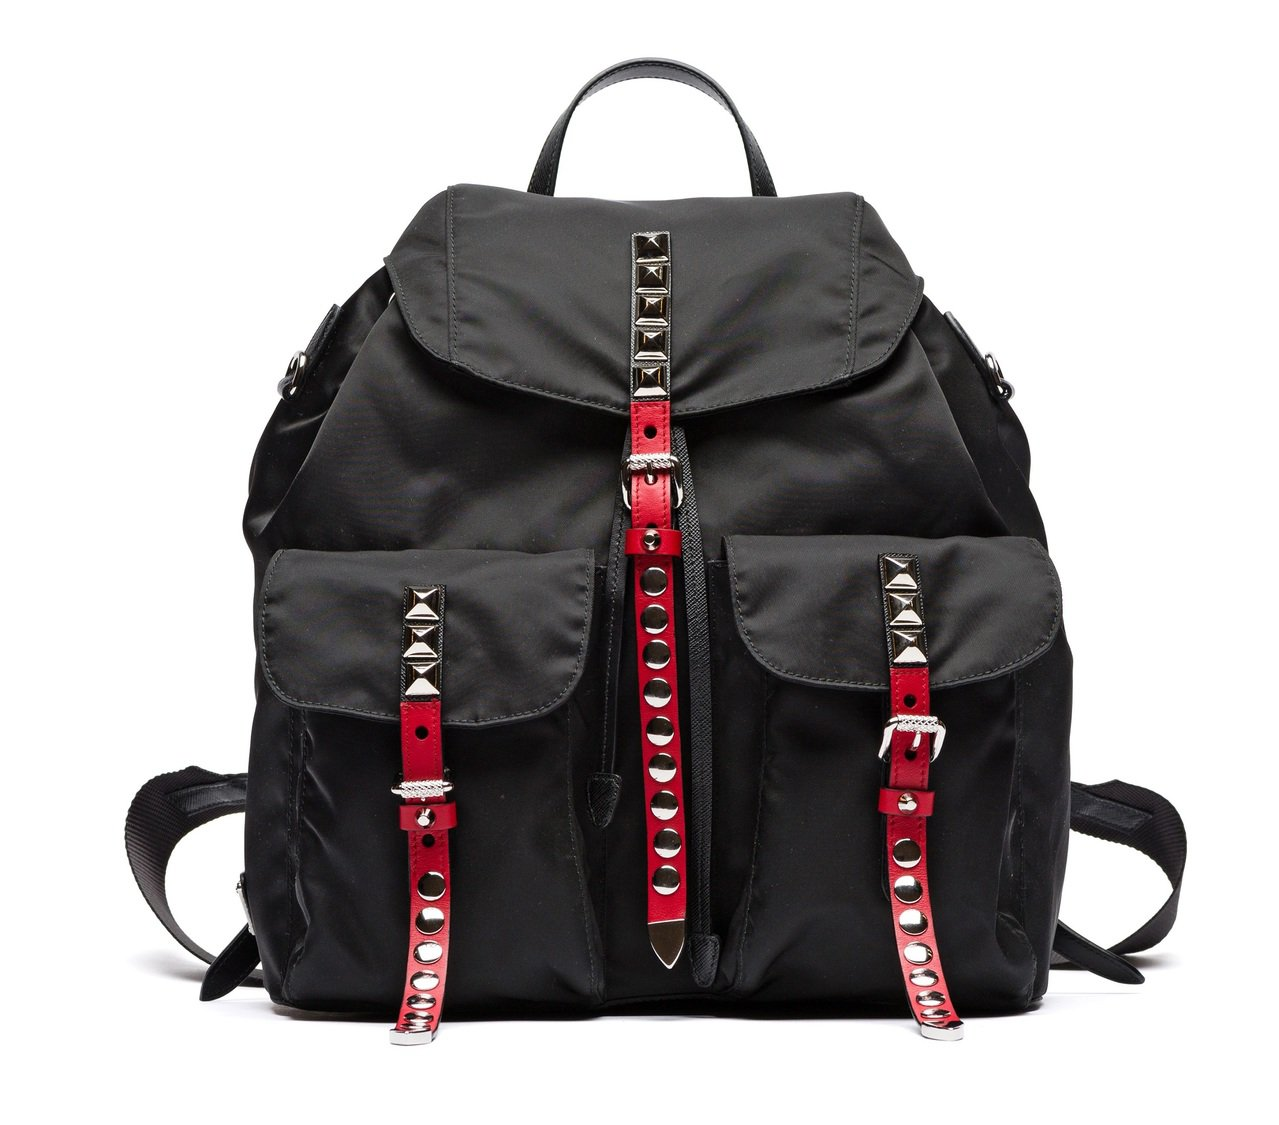 PRADA鉚釘裝飾尼龍後背包,48,500元。圖/PRADA提供